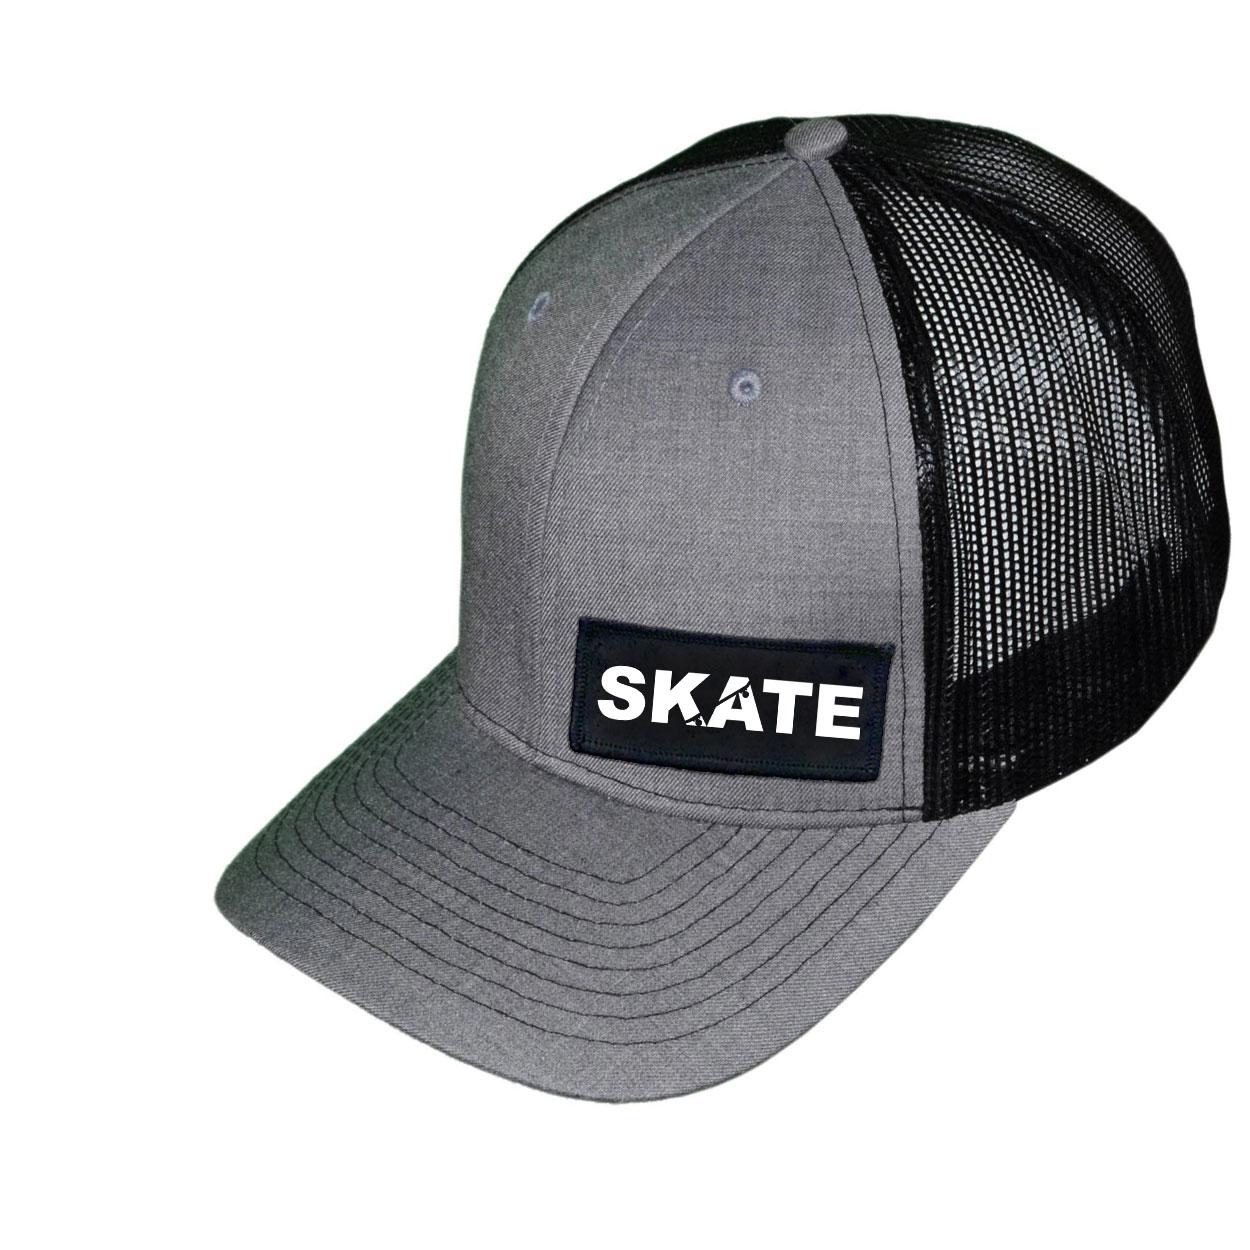 Skate Ollie Skateboard Logo Night Out Woven Patch Snapback Trucker Hat Heather Gray/Black (White Logo)